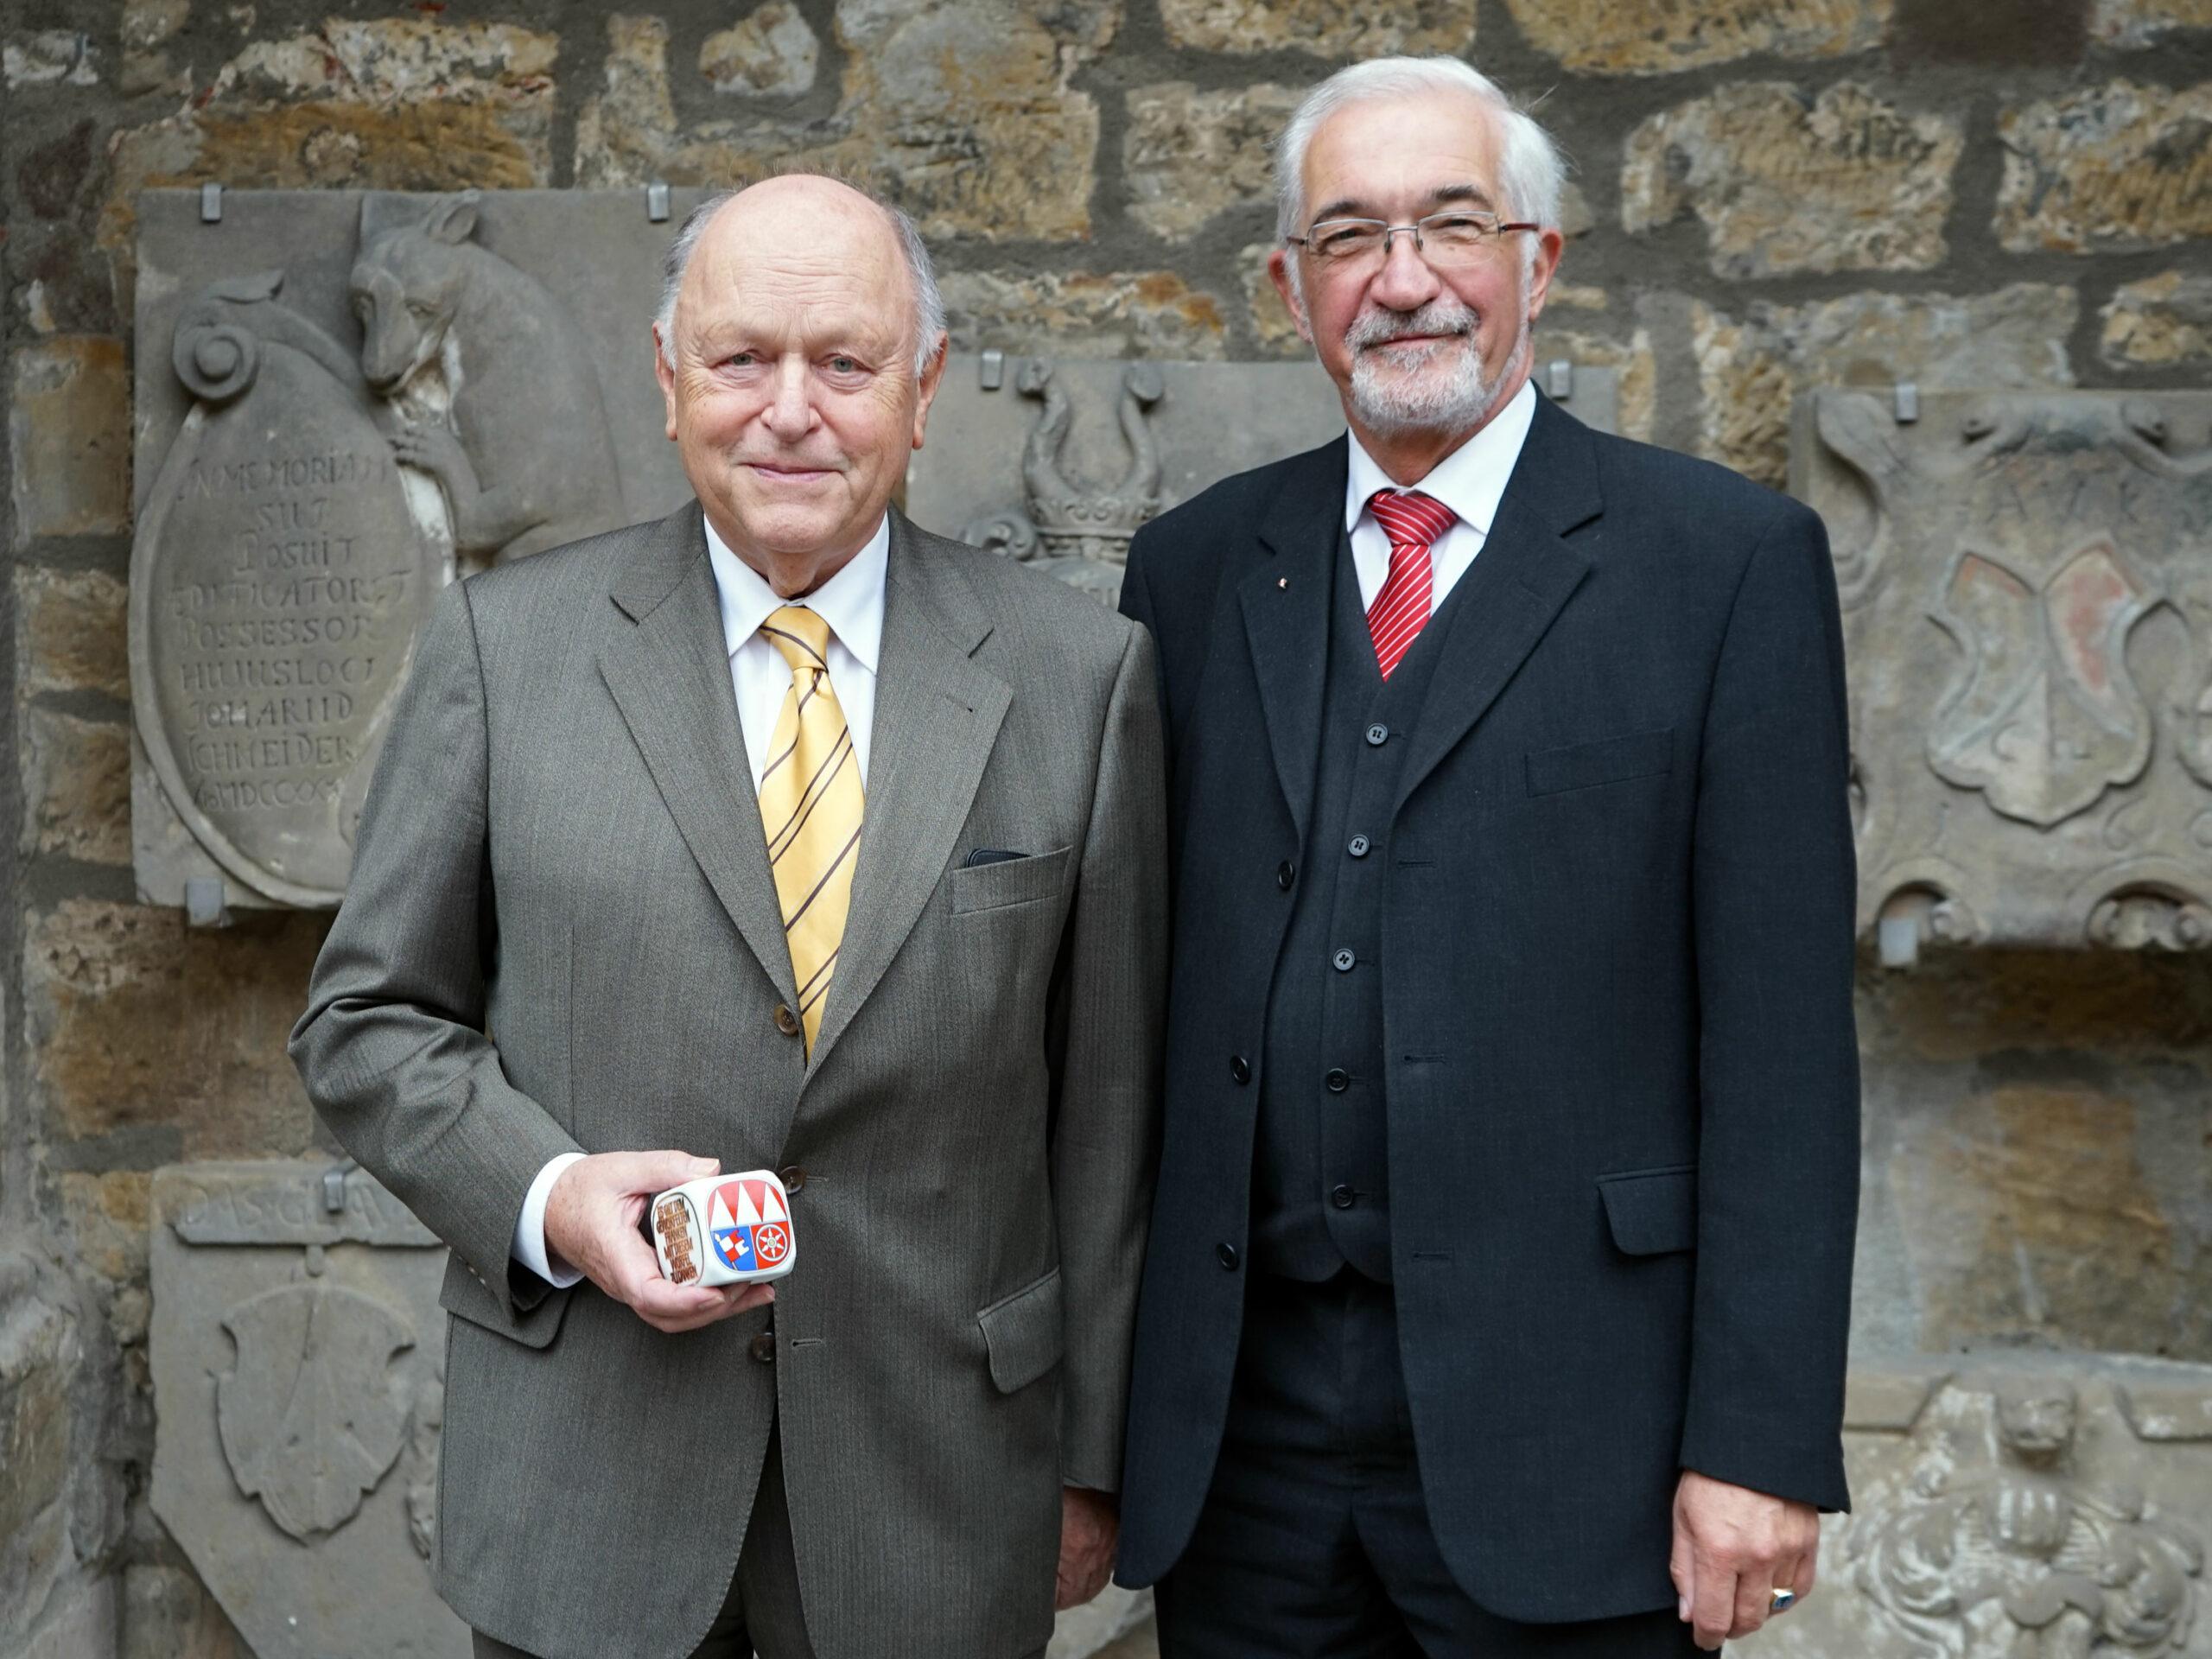 Verleihung des Frankenwürfels 2015 in Thurnau